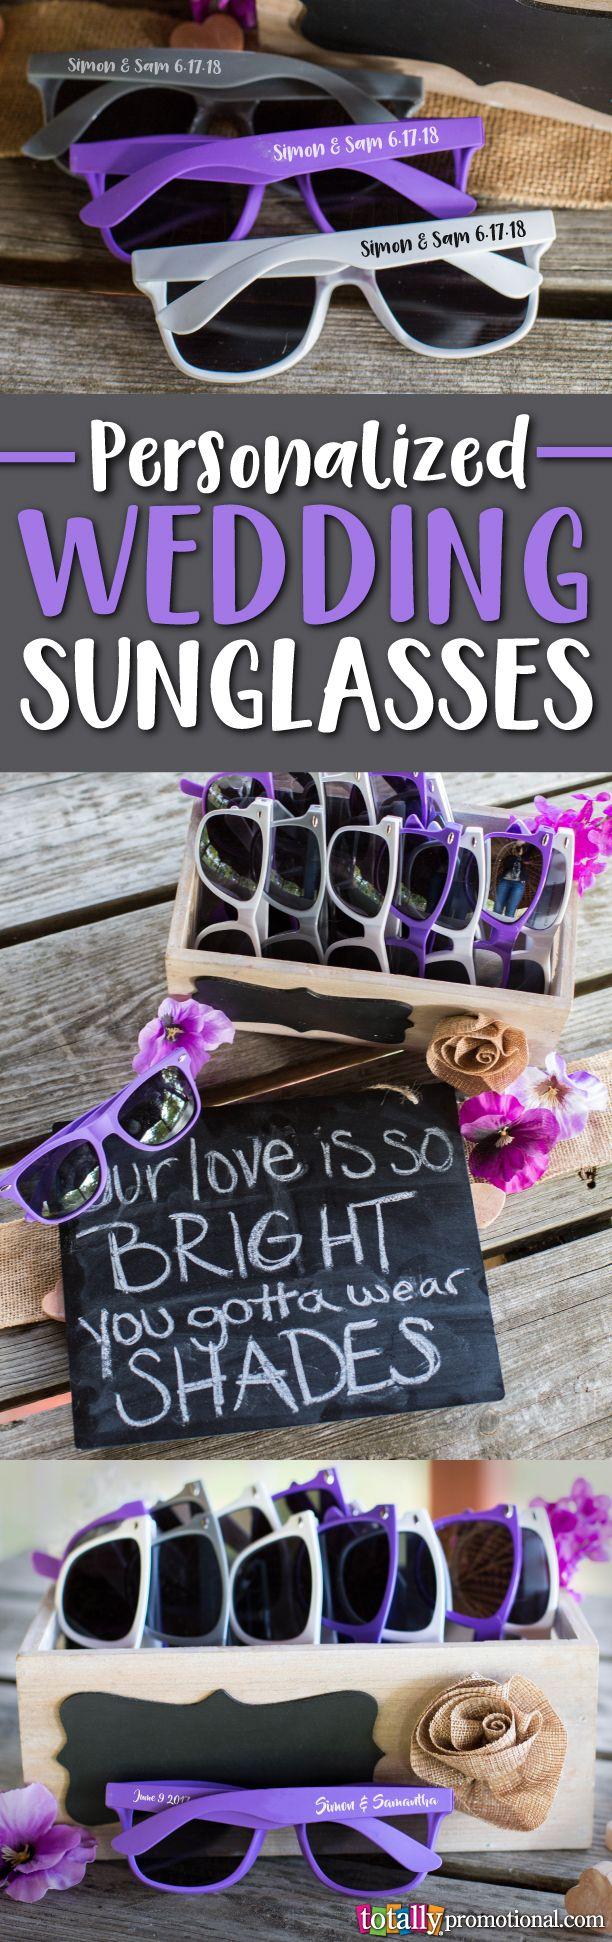 Best 25 Personalized wedding favors ideas on Pinterest Custom